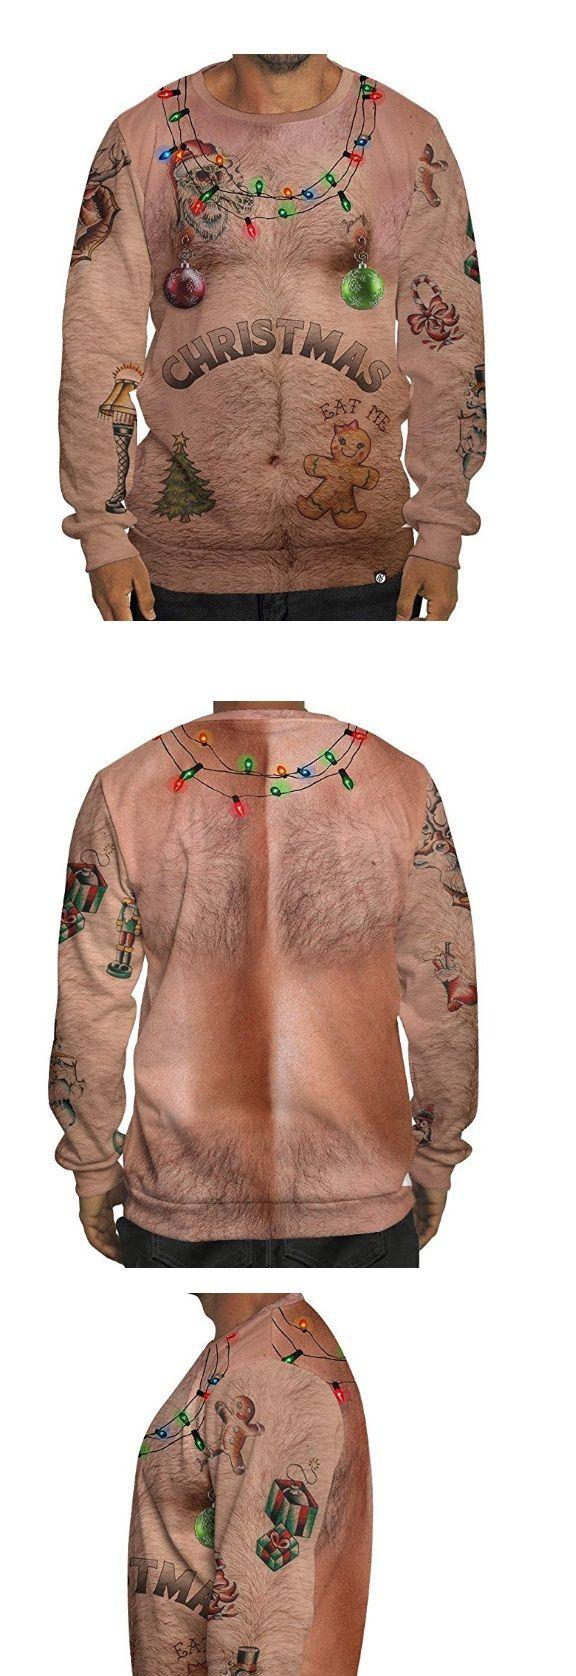 Bare Chest Ugly Christmas Sweater Pinterest Ugliest Christmas